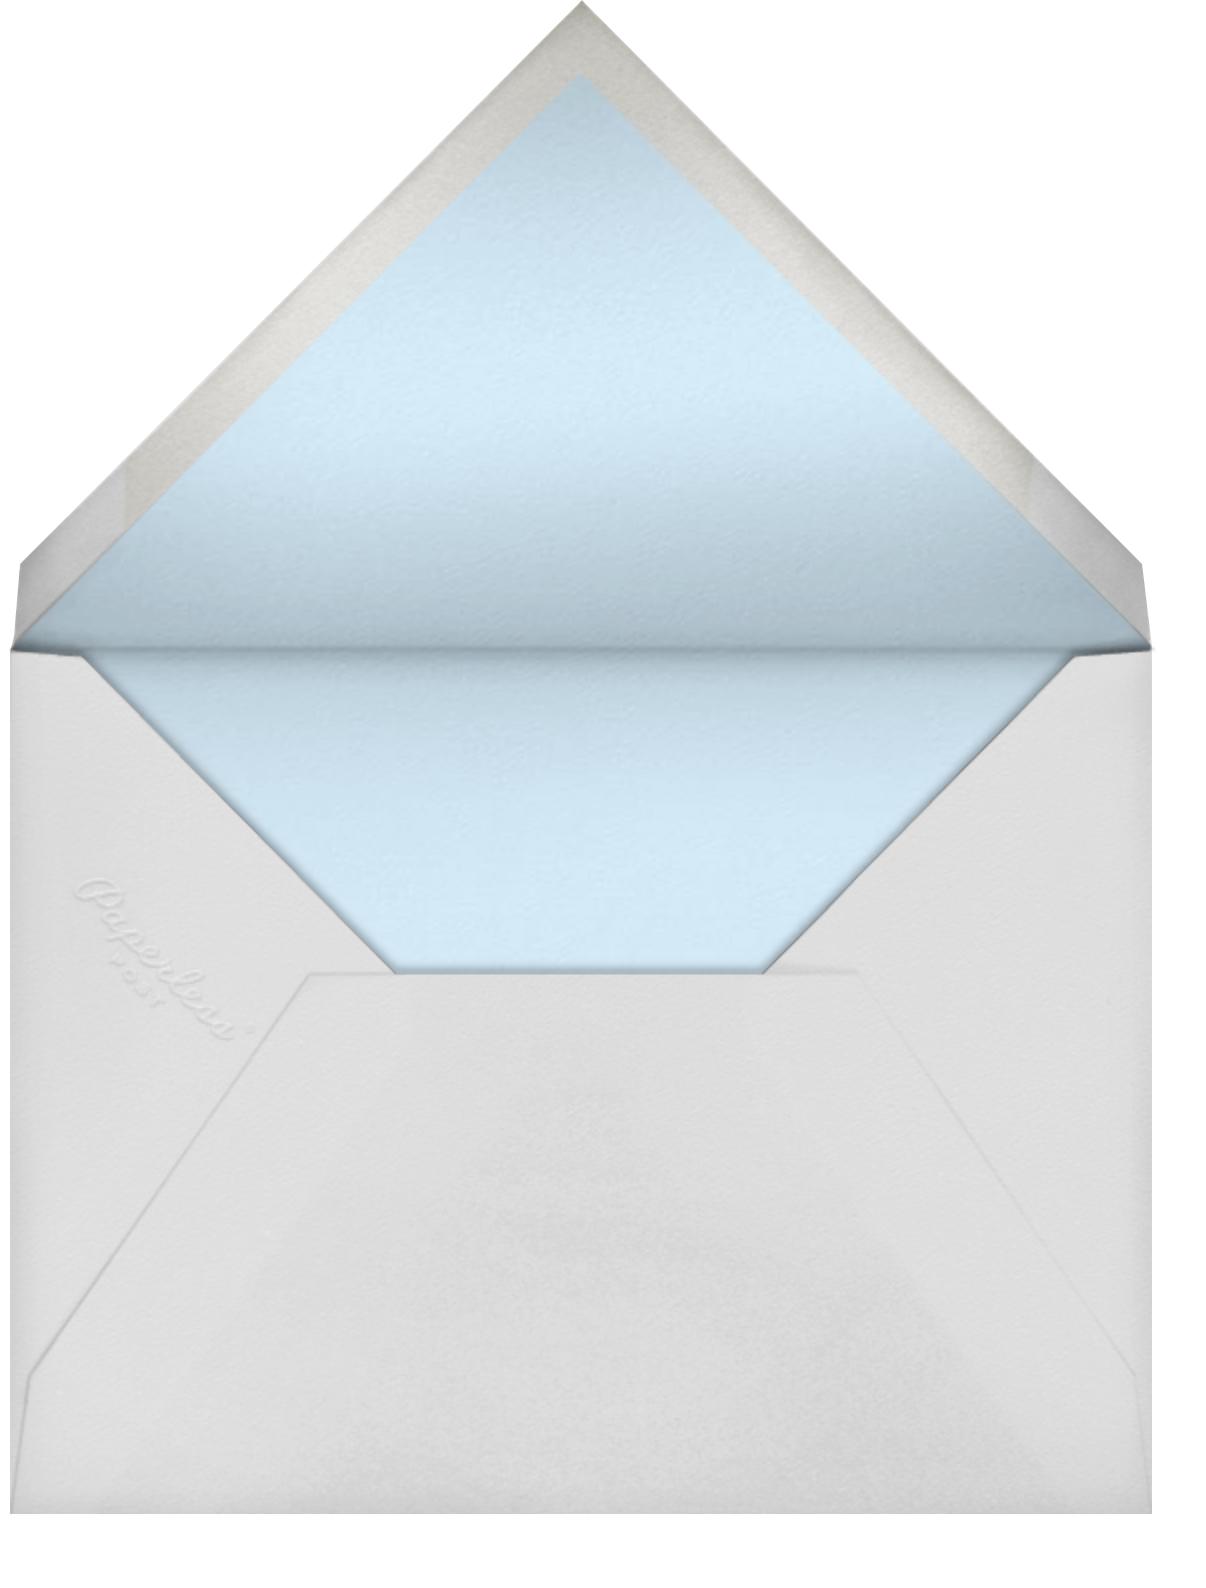 Rabbit - Sweet Pea - Paperless Post - Easter - envelope back